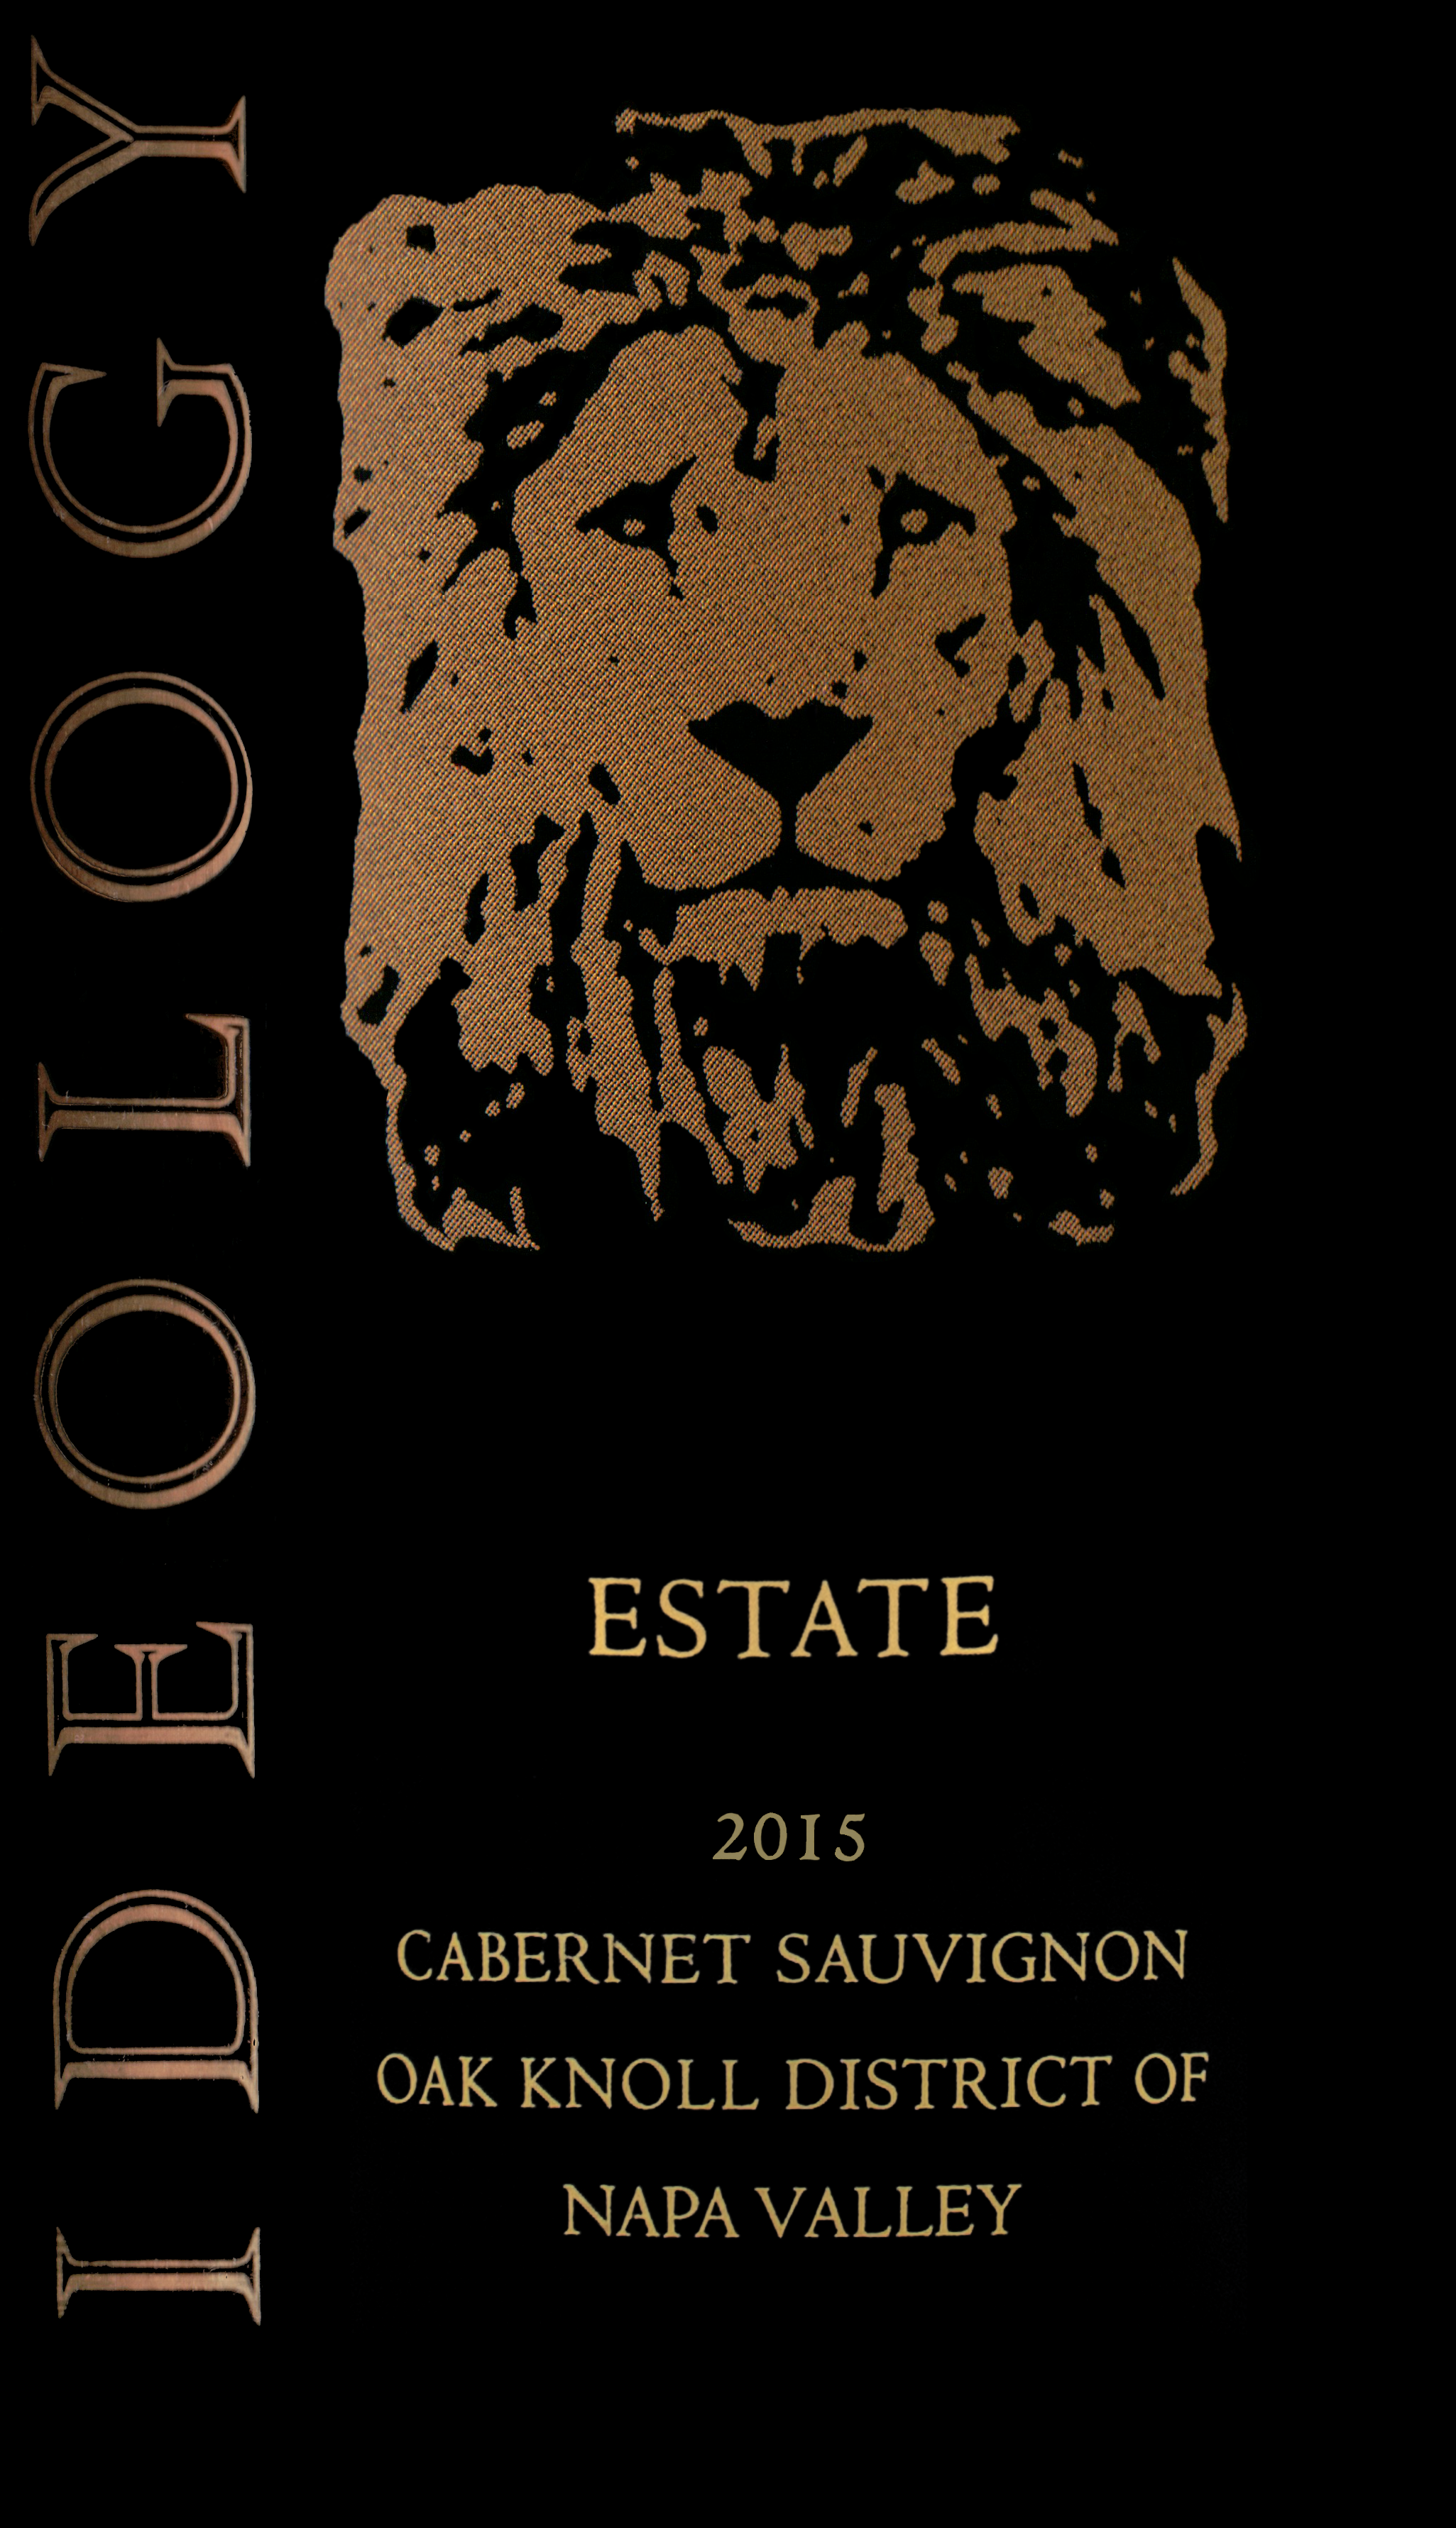 Ideology Oak Knoll Estate Cabernet Sauvignon 2015